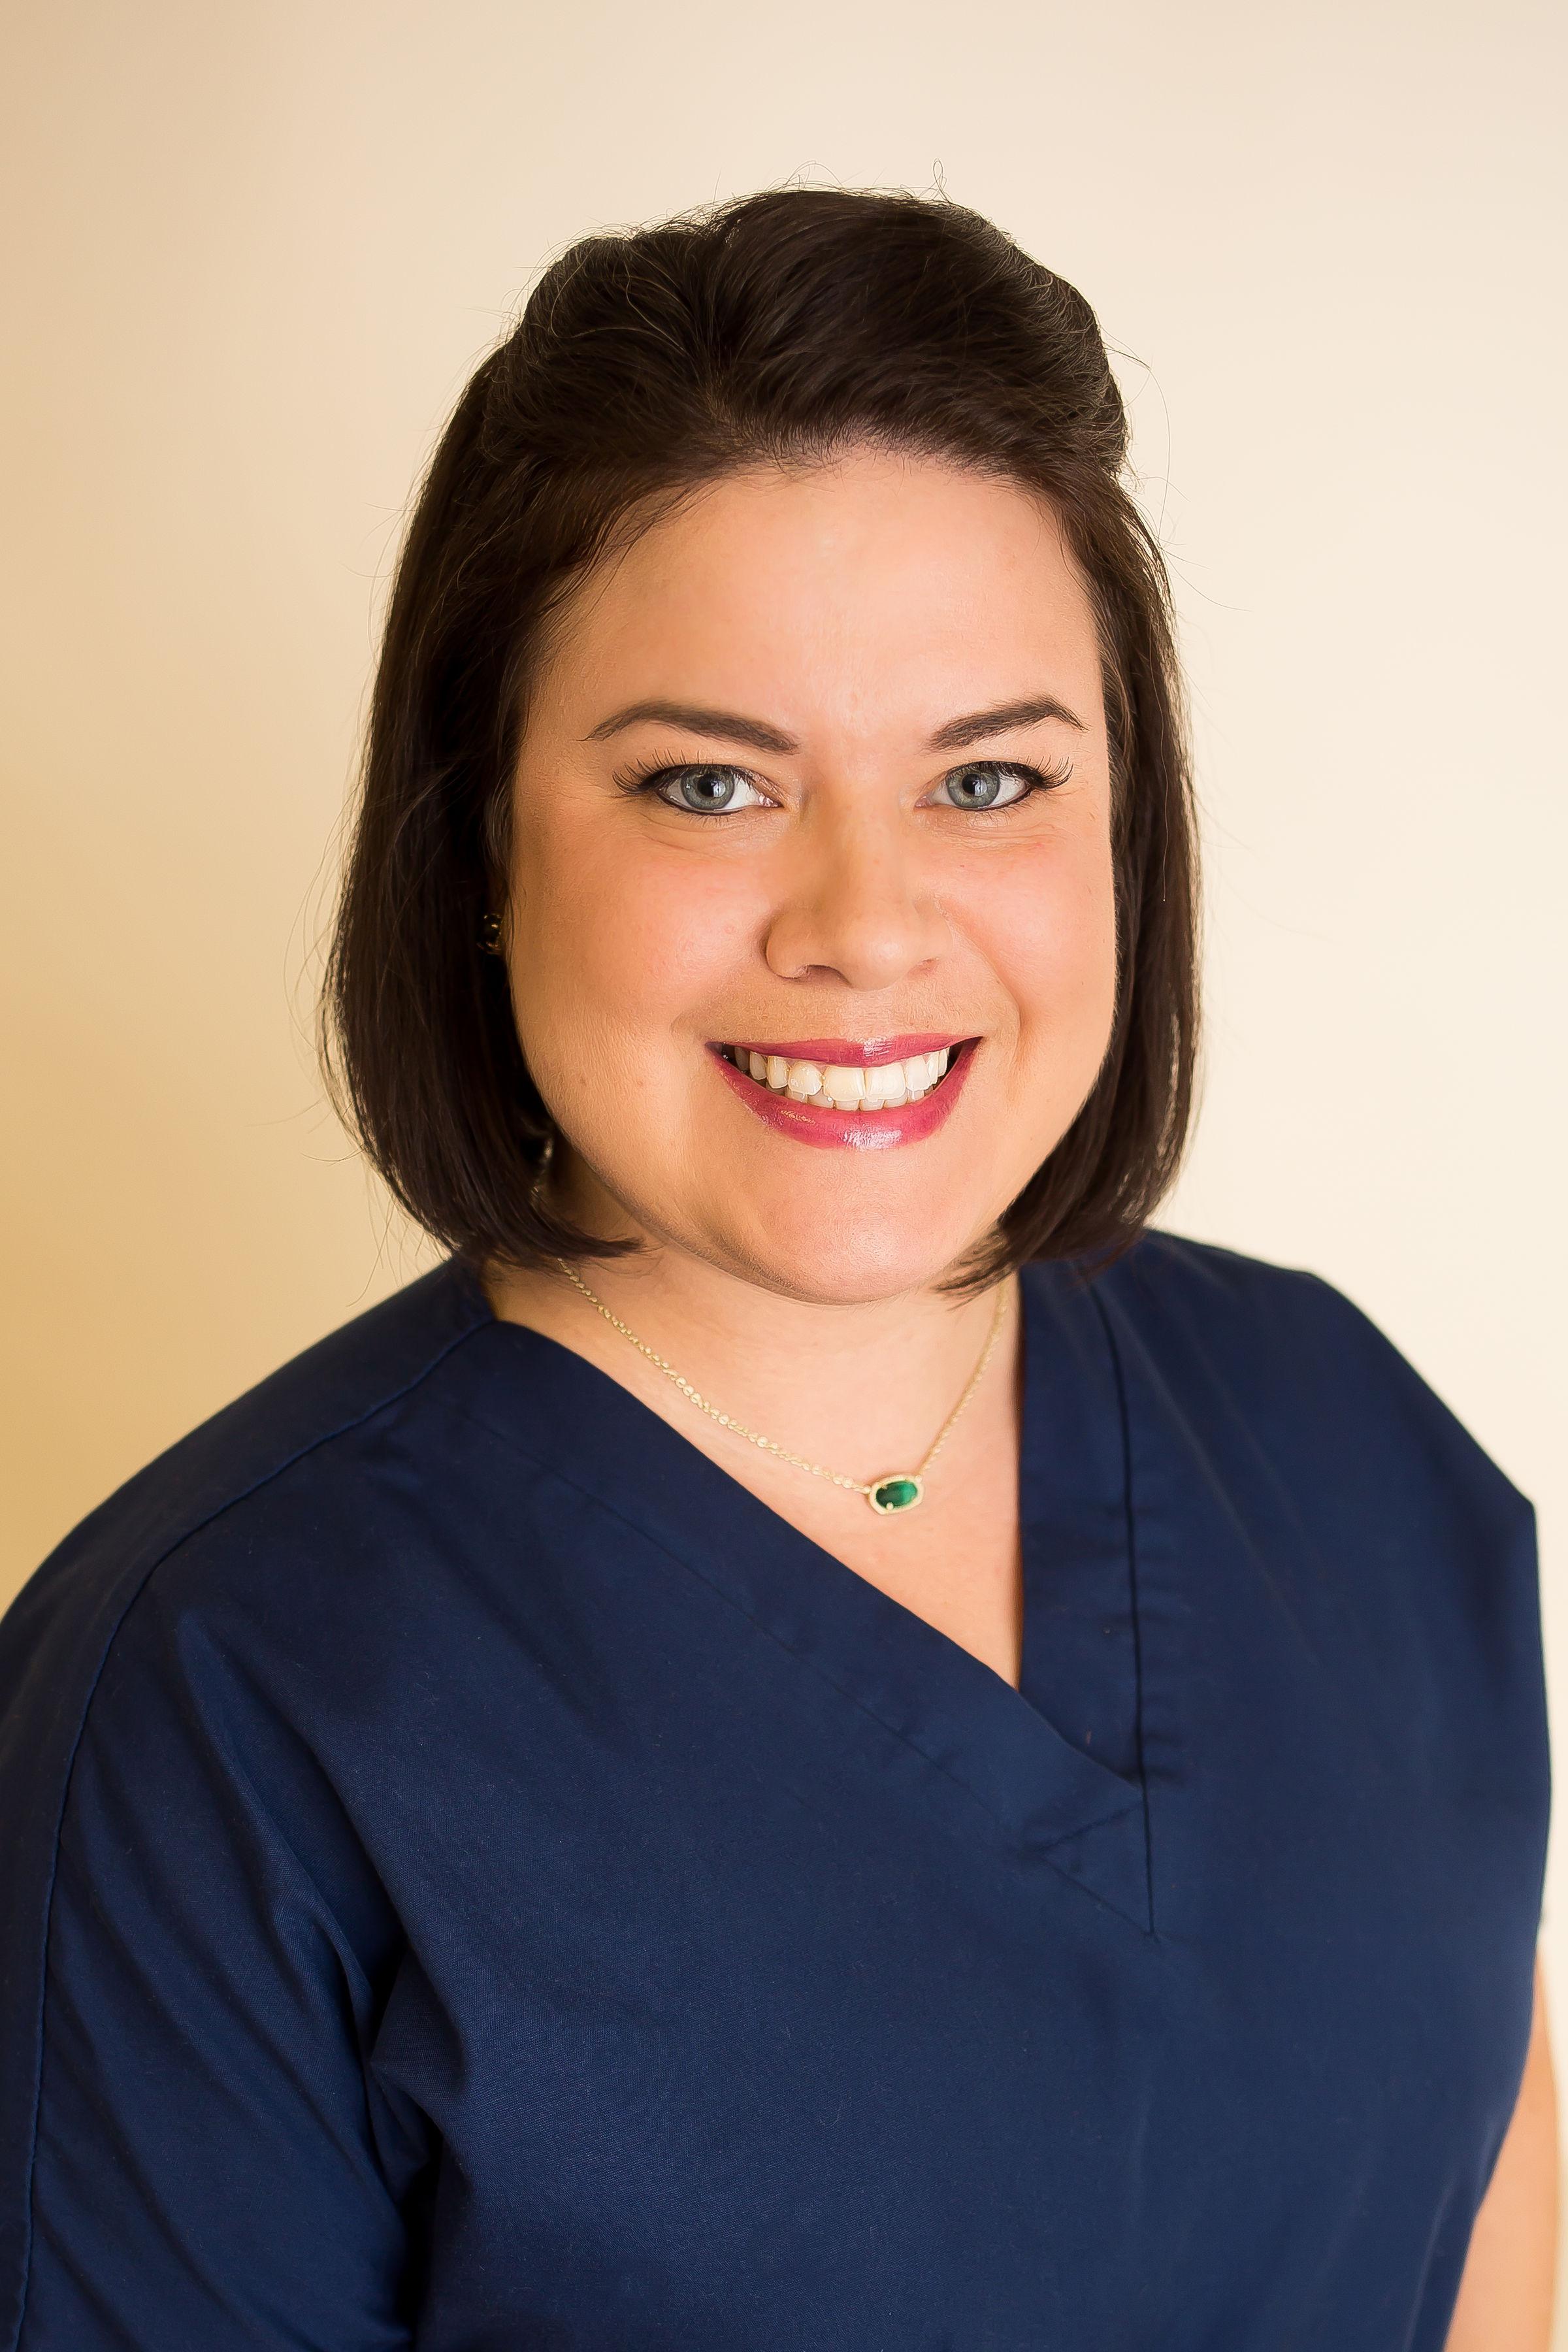 JAIME MINCE, R.N. of Nurse Paralegal USA